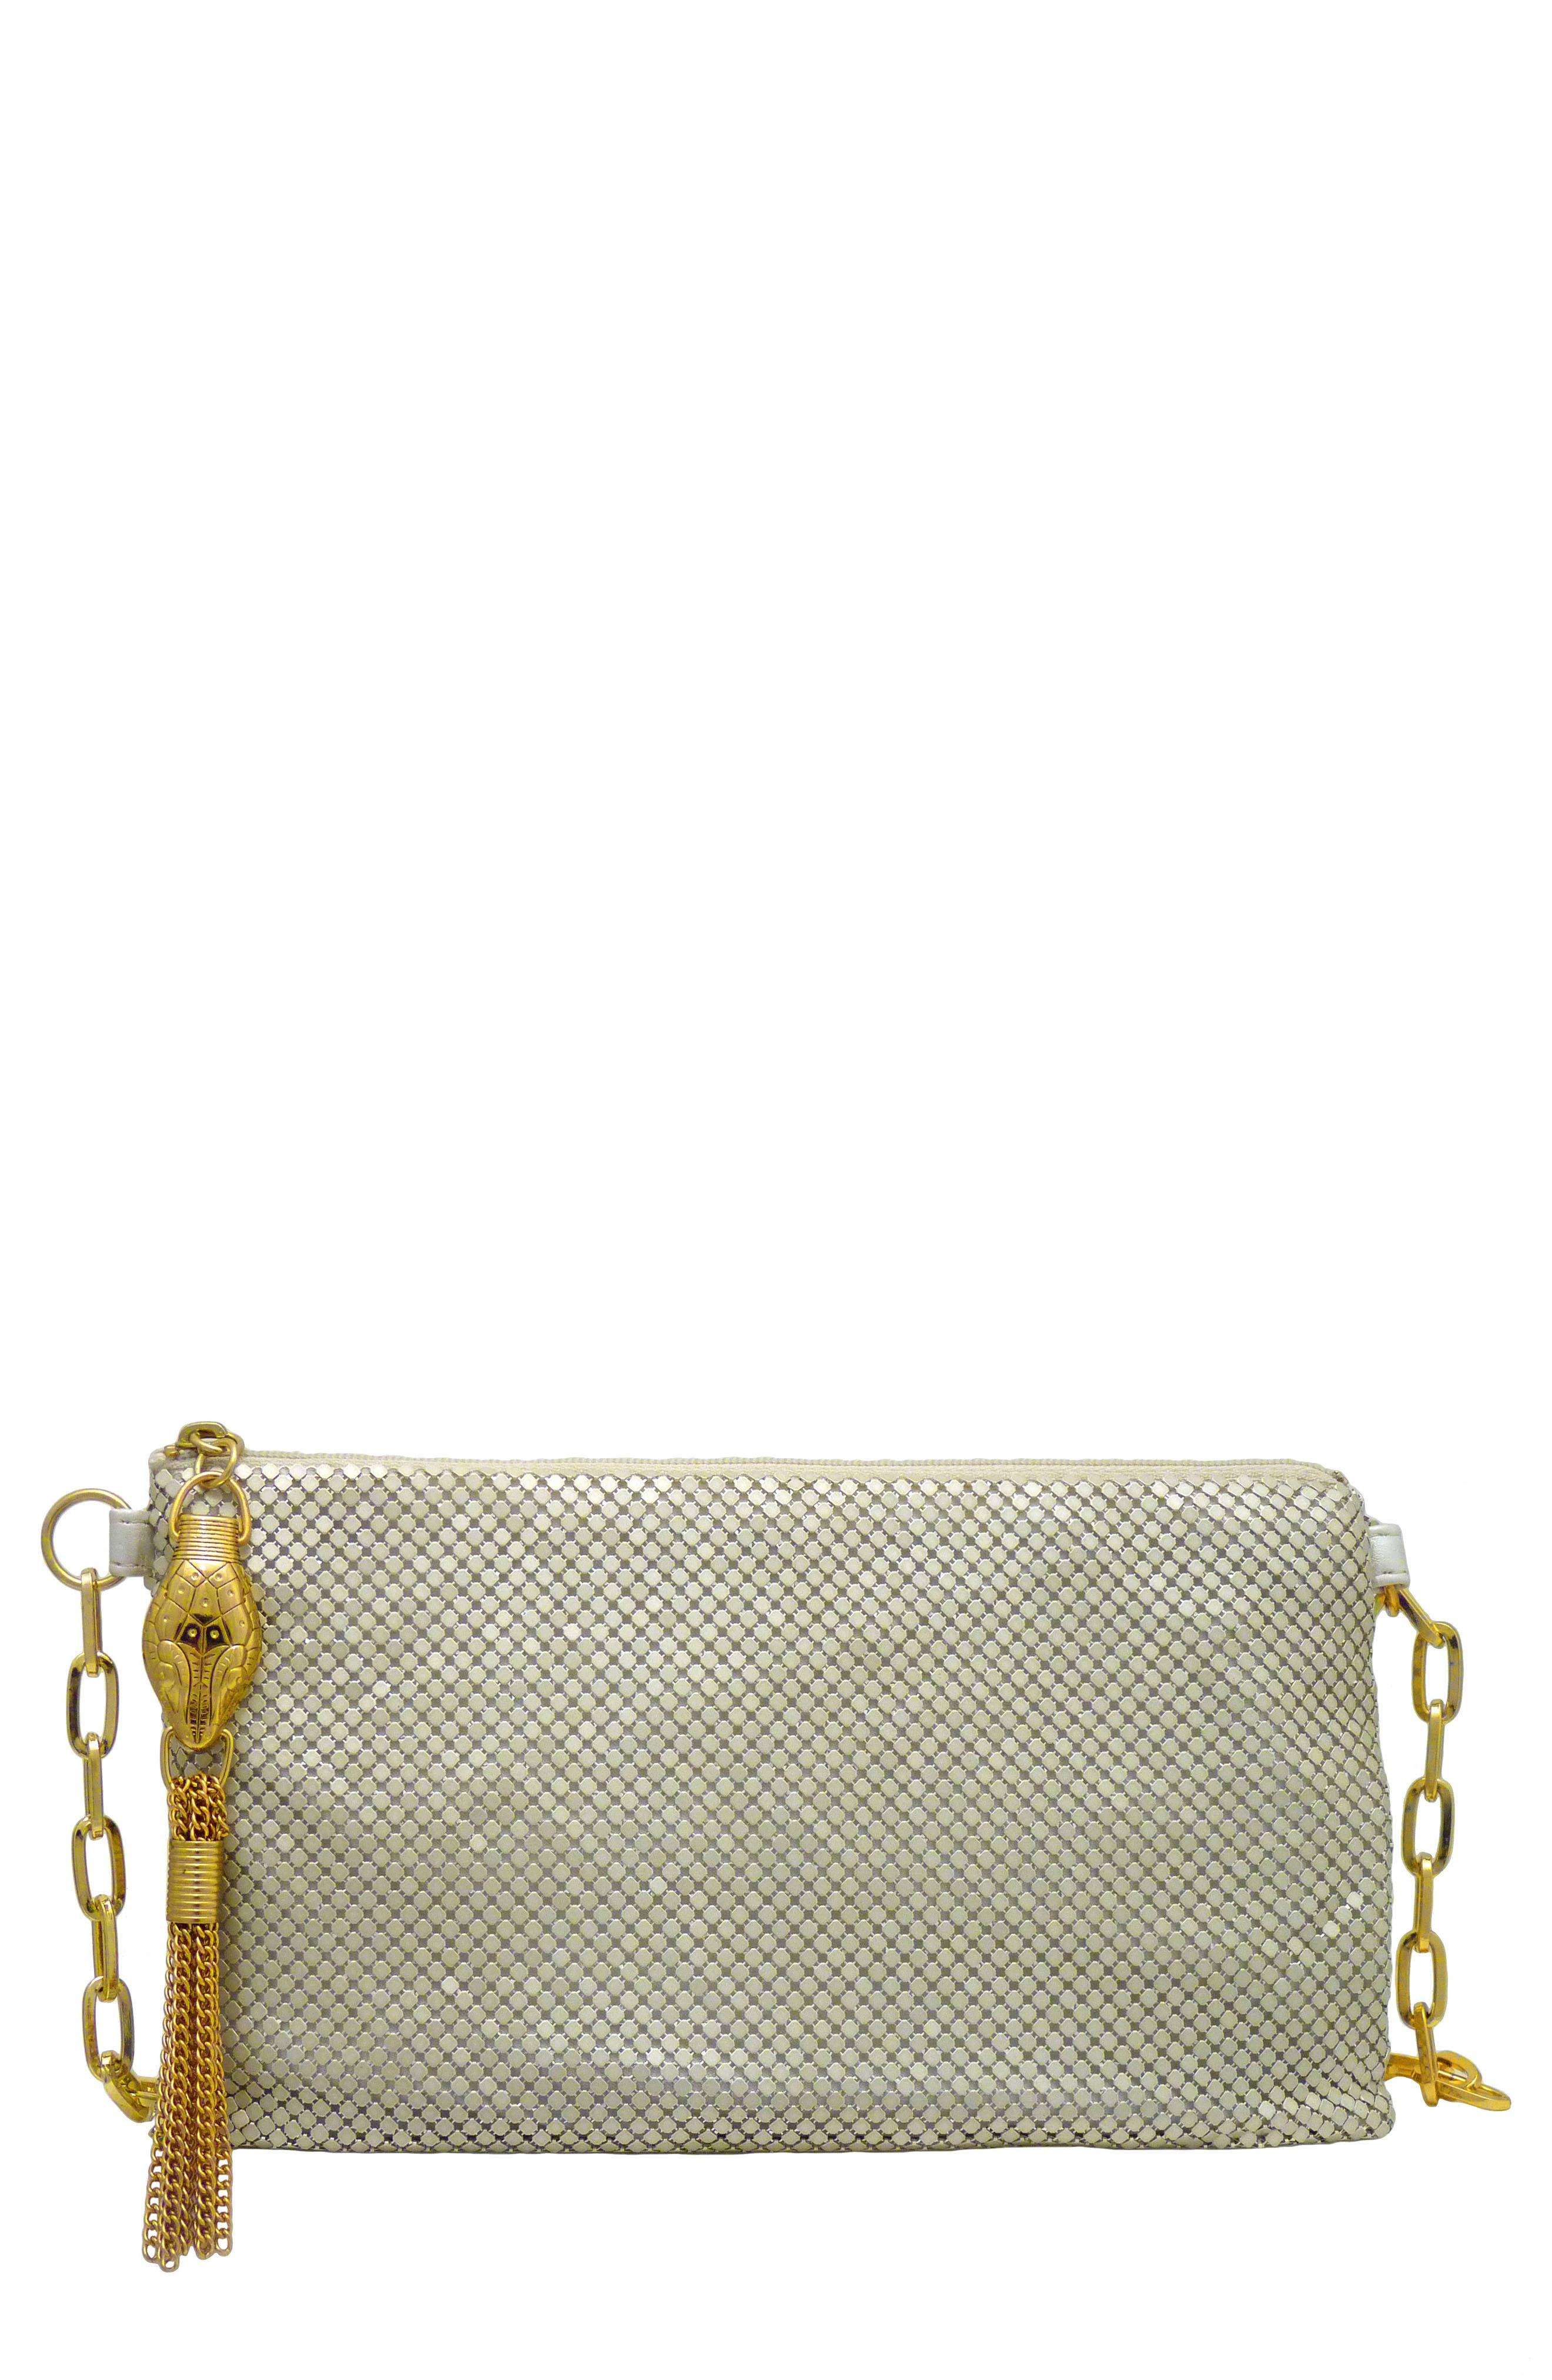 Snakehead Mesh Belt Bag - Metallic in Pearl